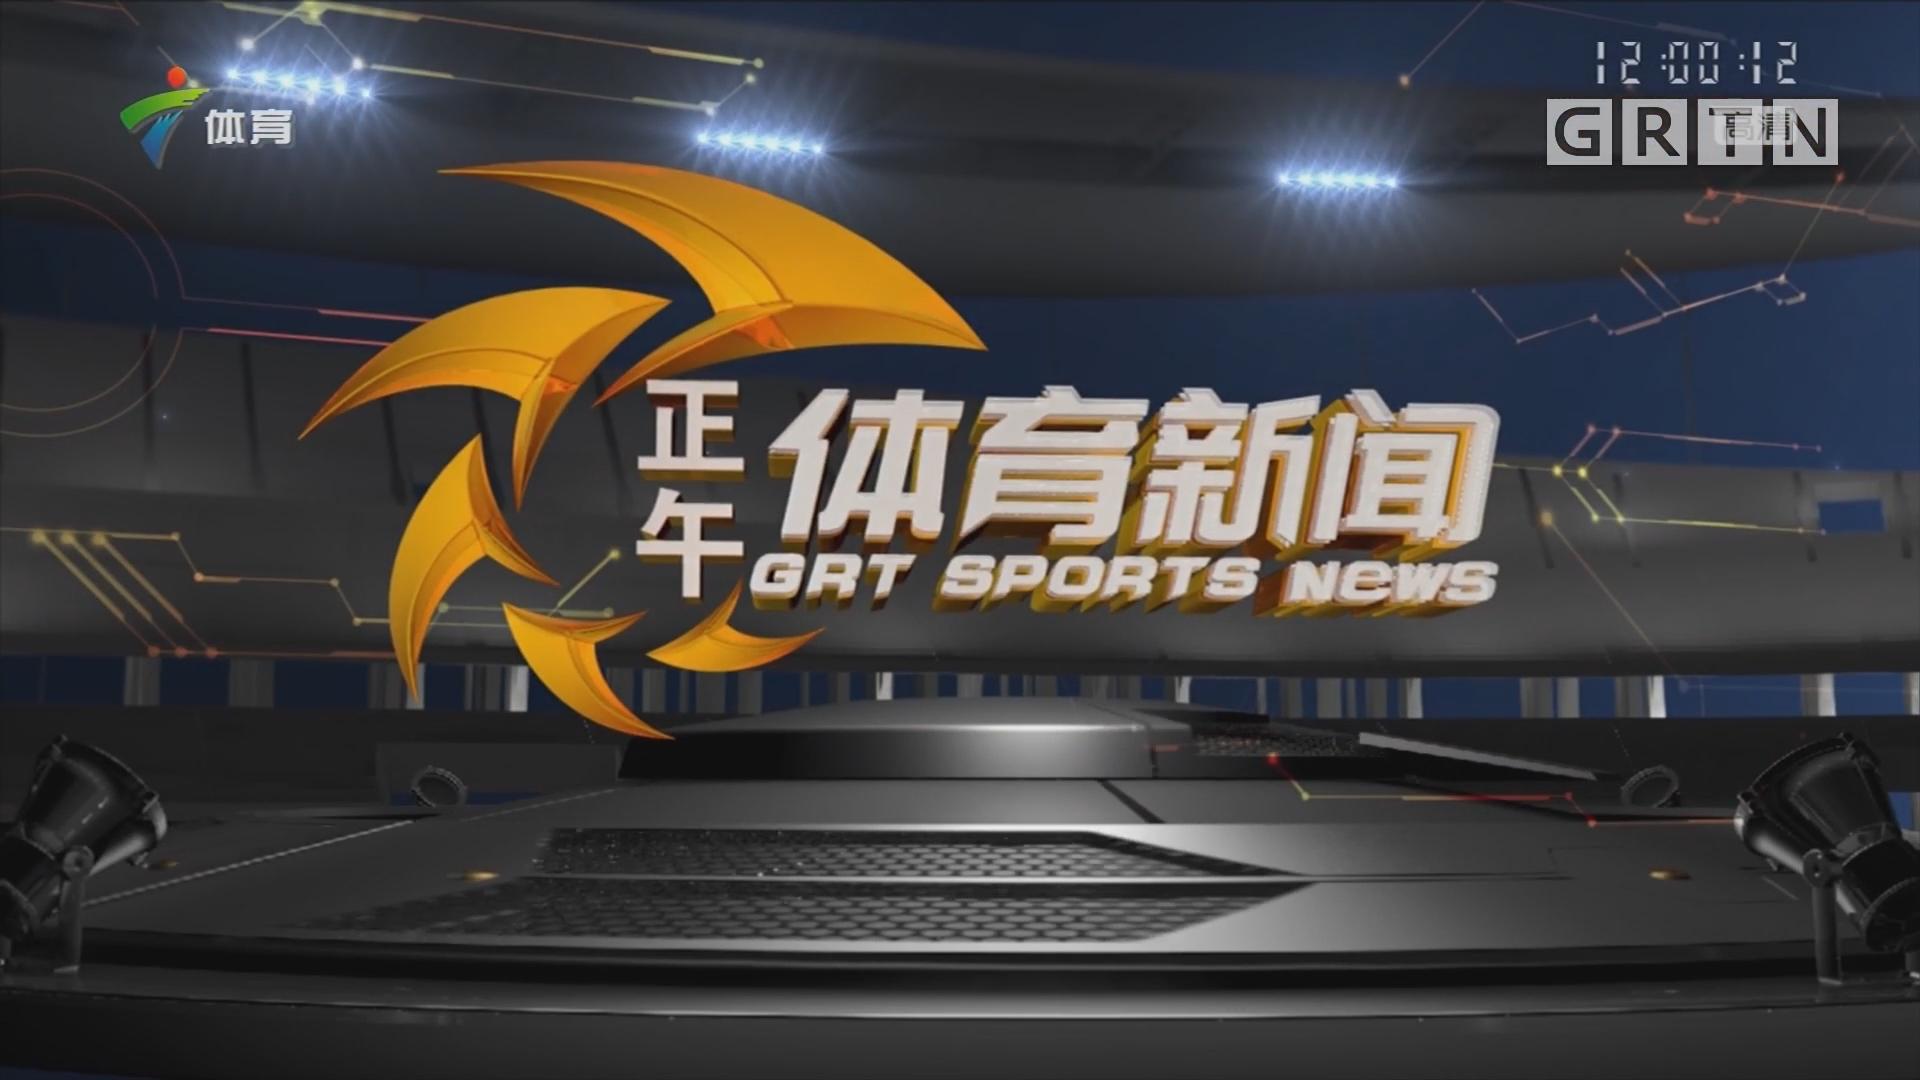 [HD][2018-02-08]正午体育新闻:广州大胜吉林 队史首进季后赛